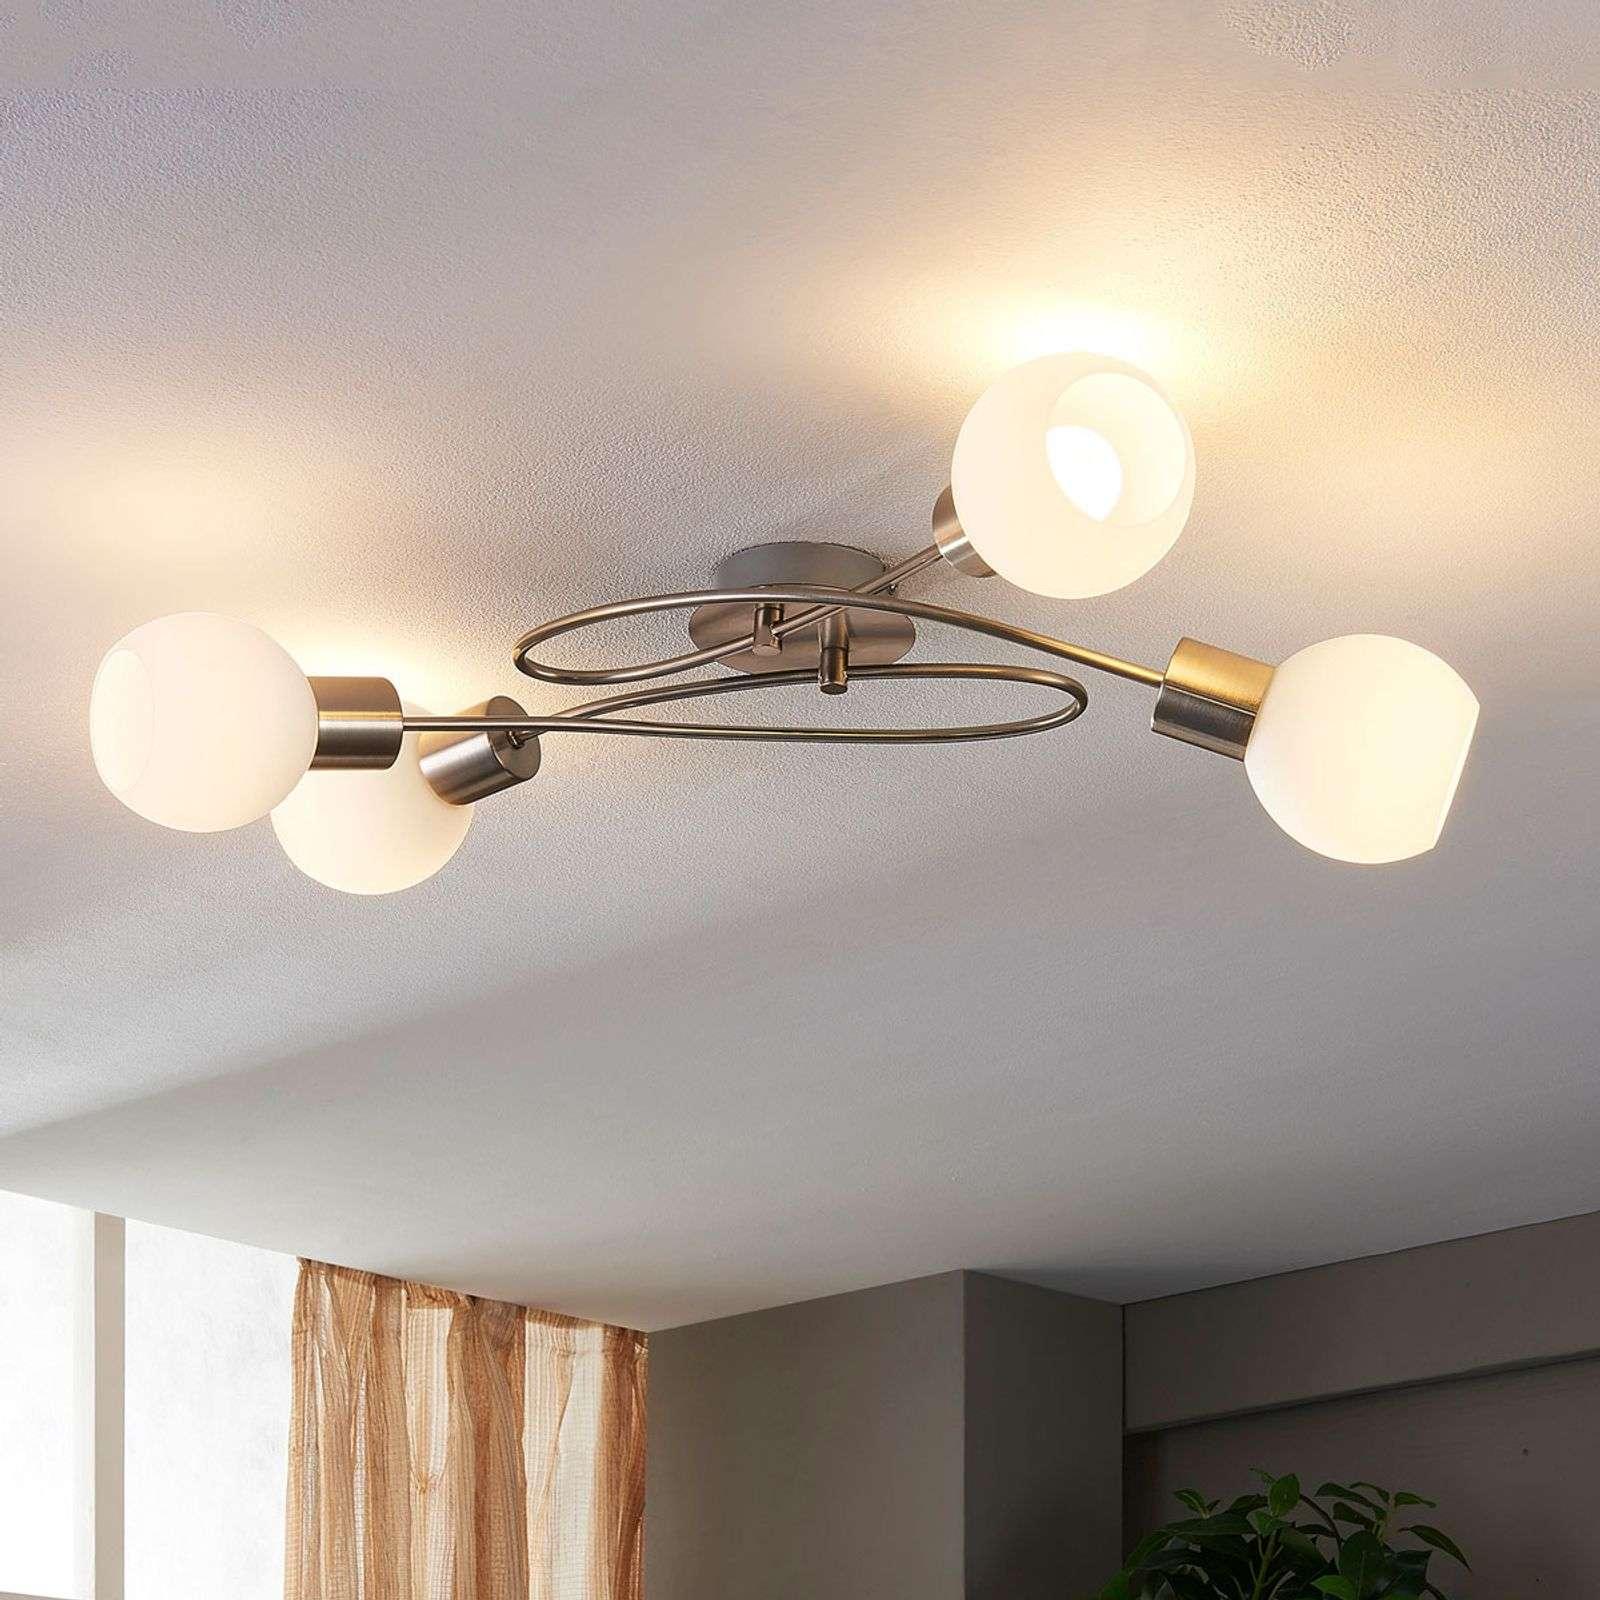 Lampenwelt.com Plafonnier LED Hailey à 4 lampes, nickel - LAMPENWELT.com